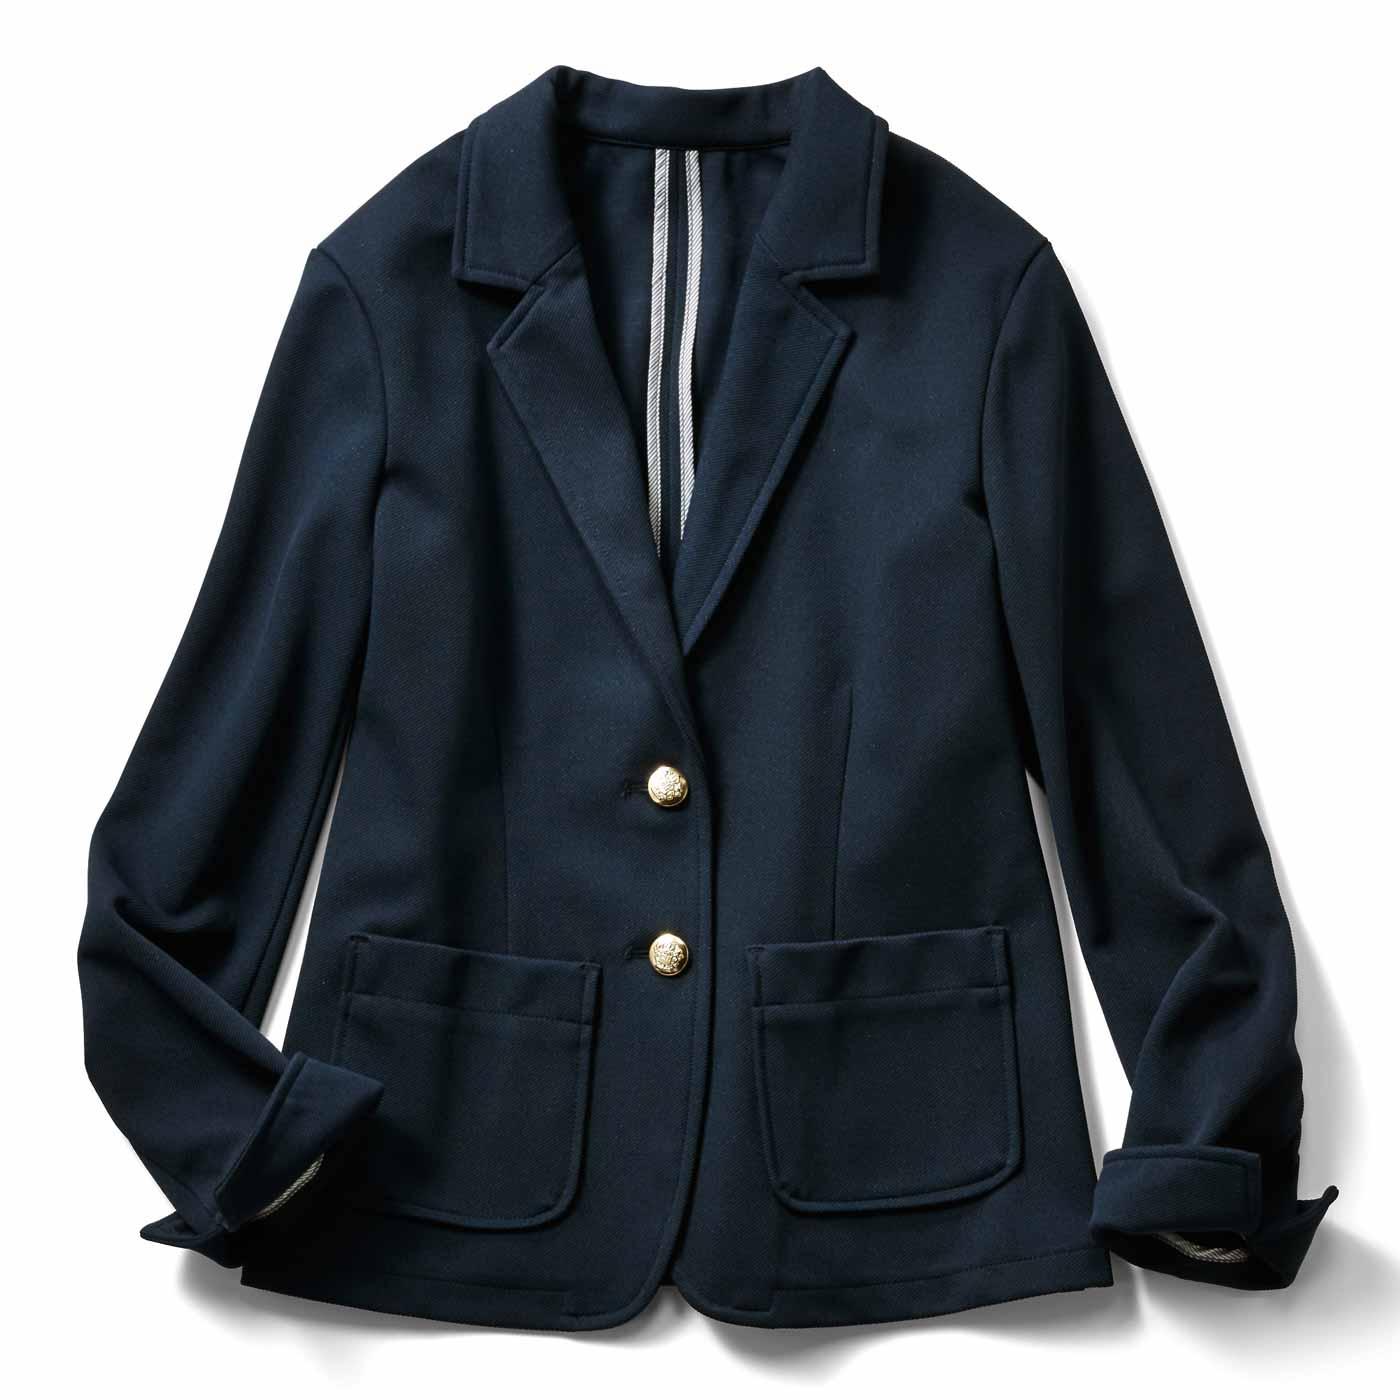 IEDIT[イディット] 着心地快適なカットソーツイル素材のネイビージャケット